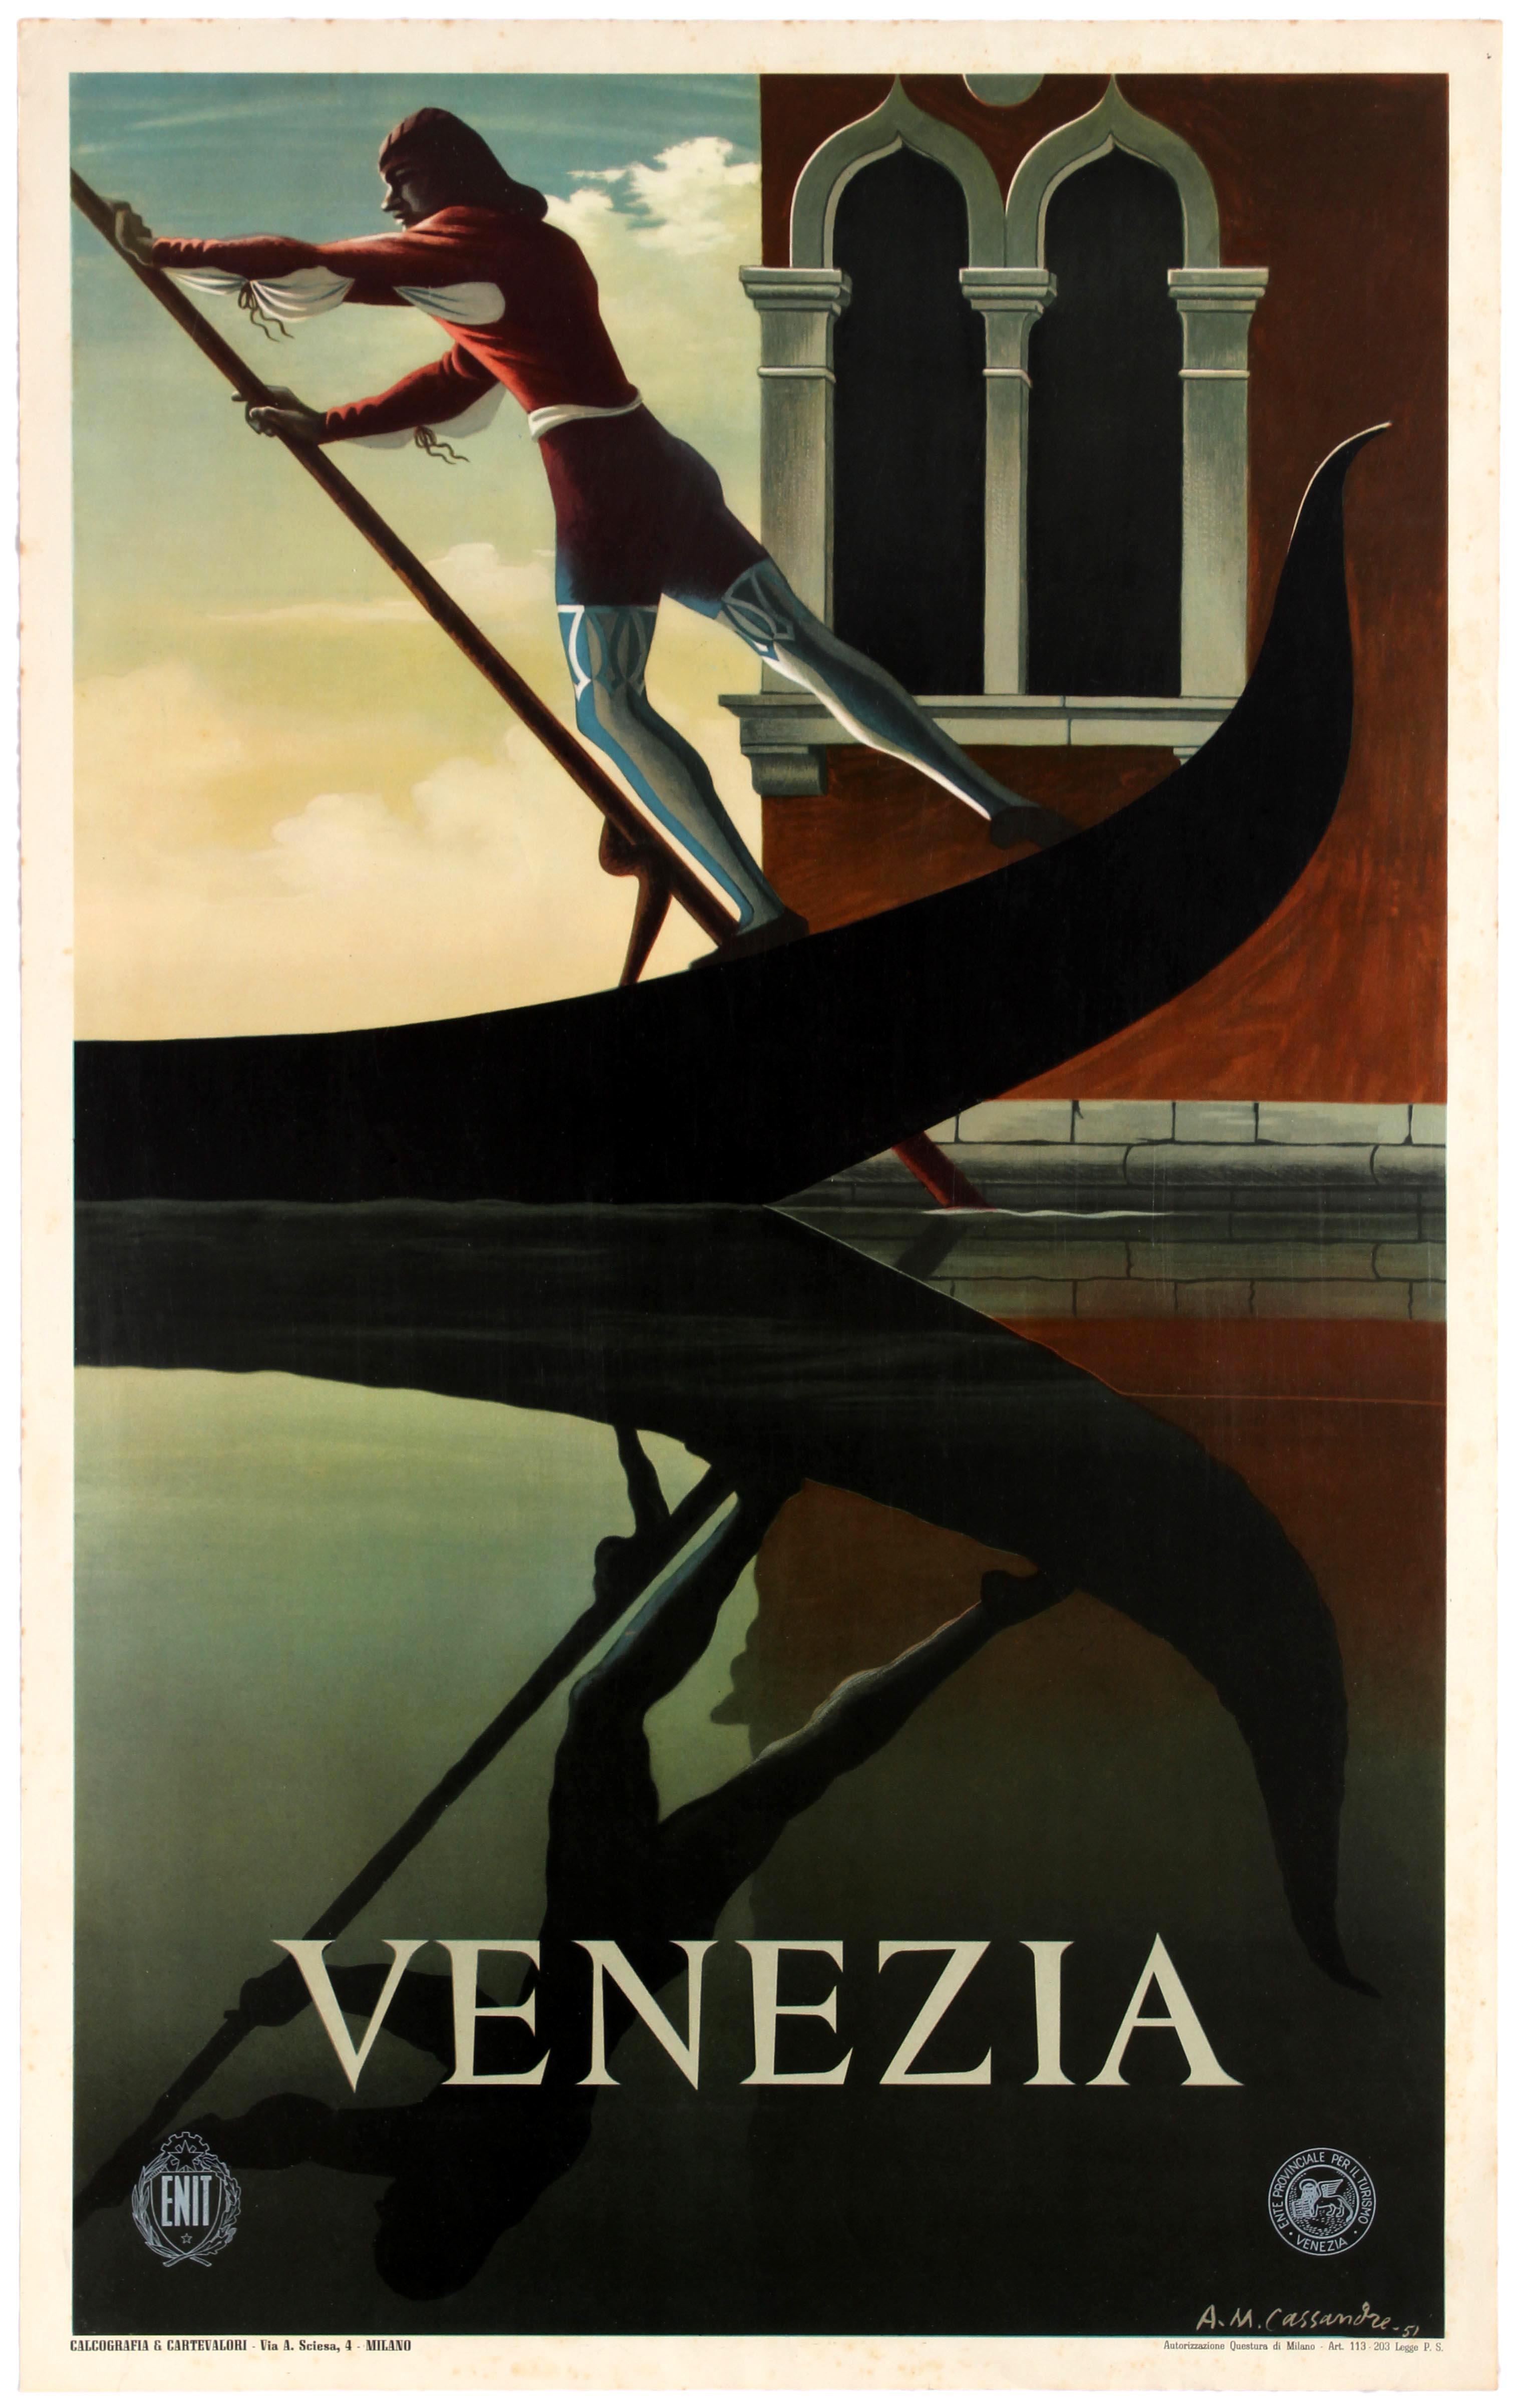 Lot 2507 - Travel Poster ENIT Venice Venezia Italy Cassandre 1951